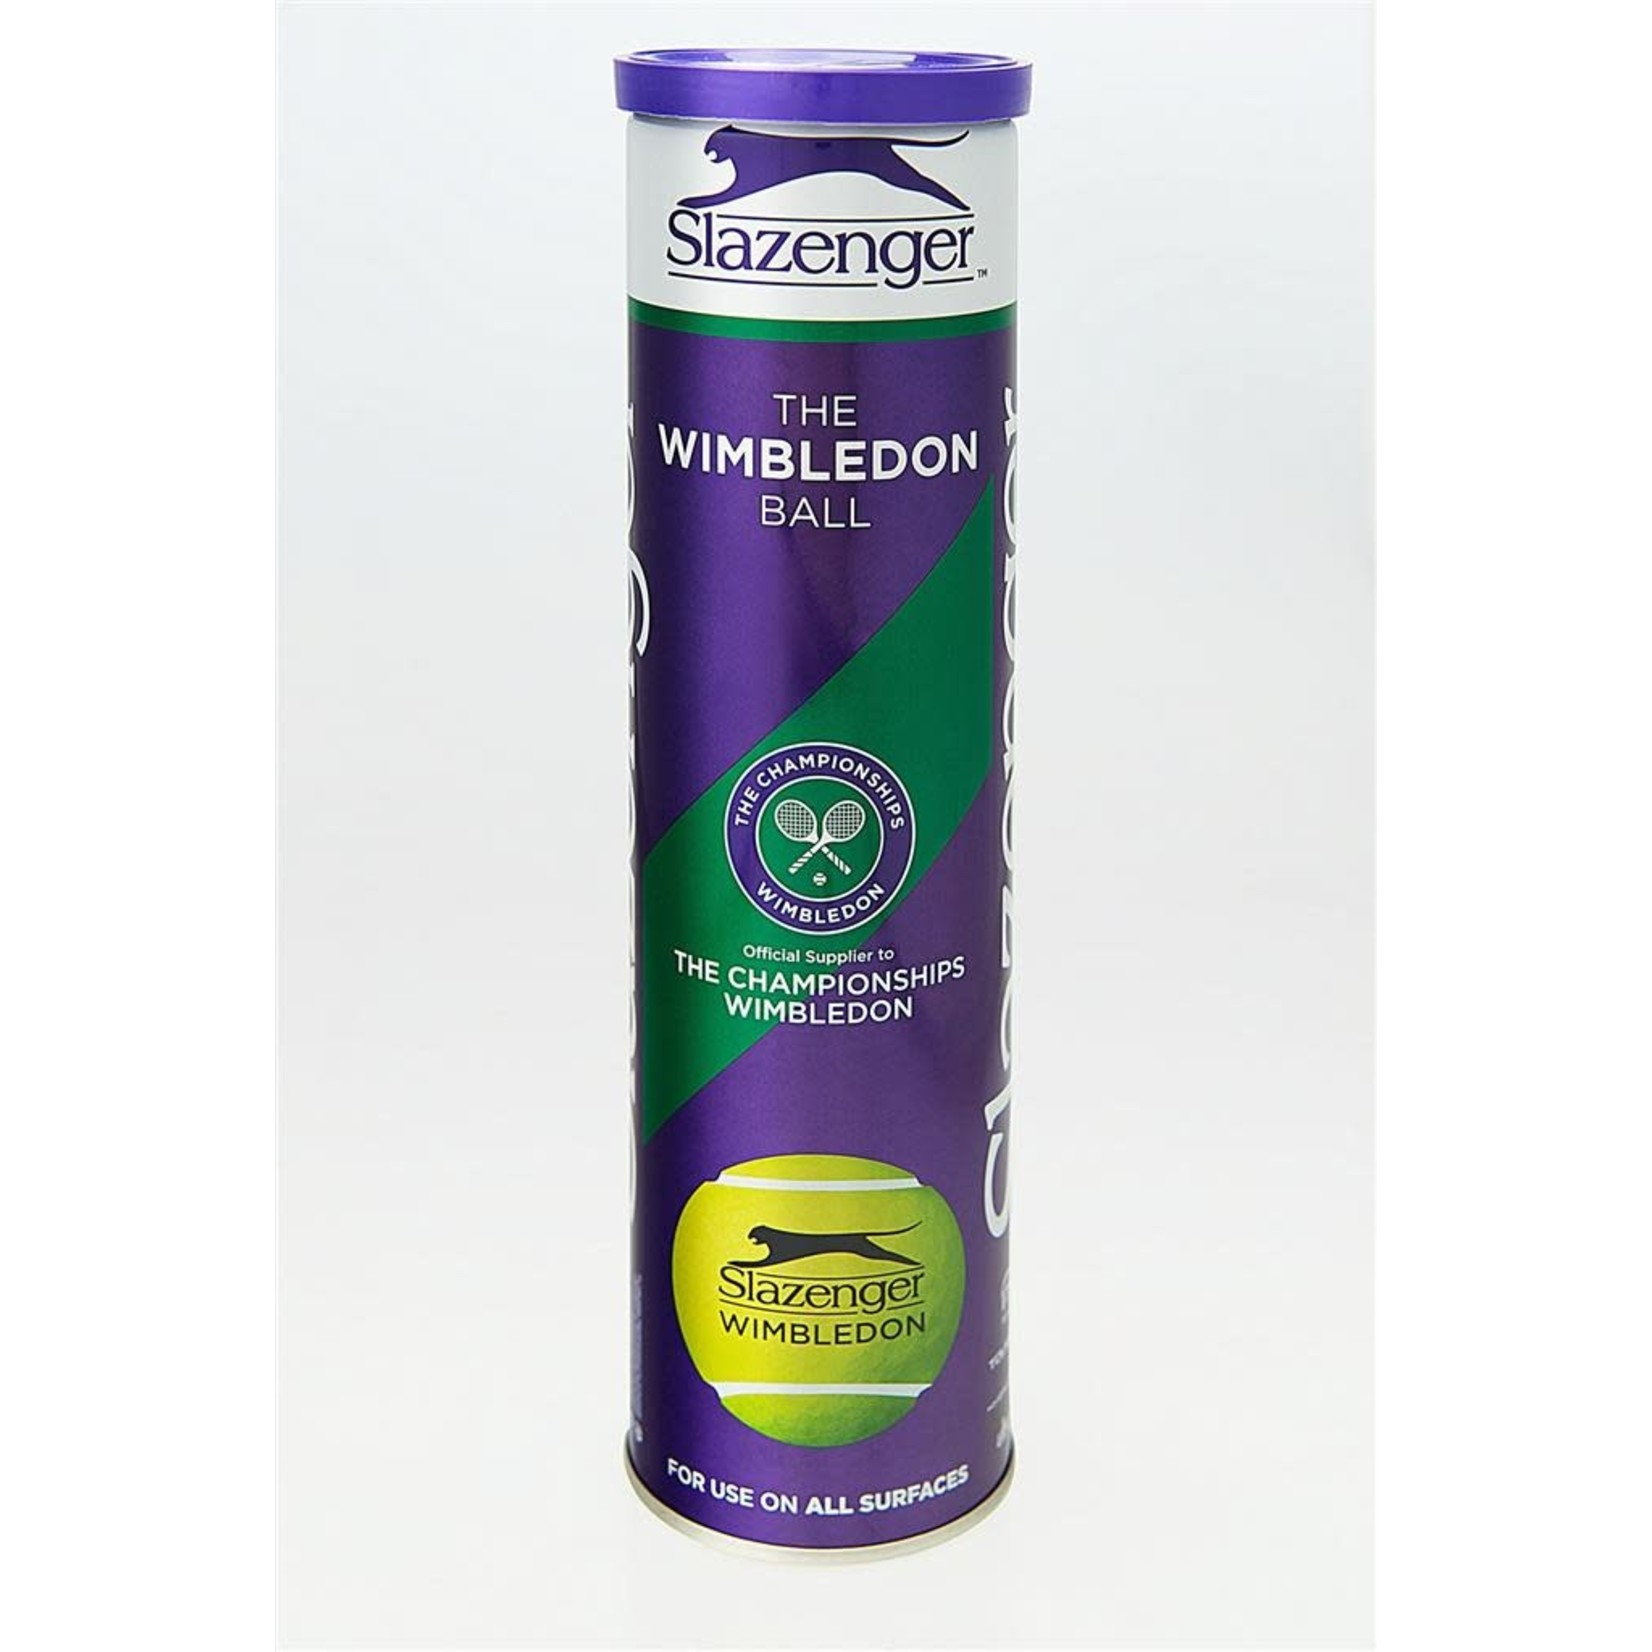 Slazenger Wimbledon